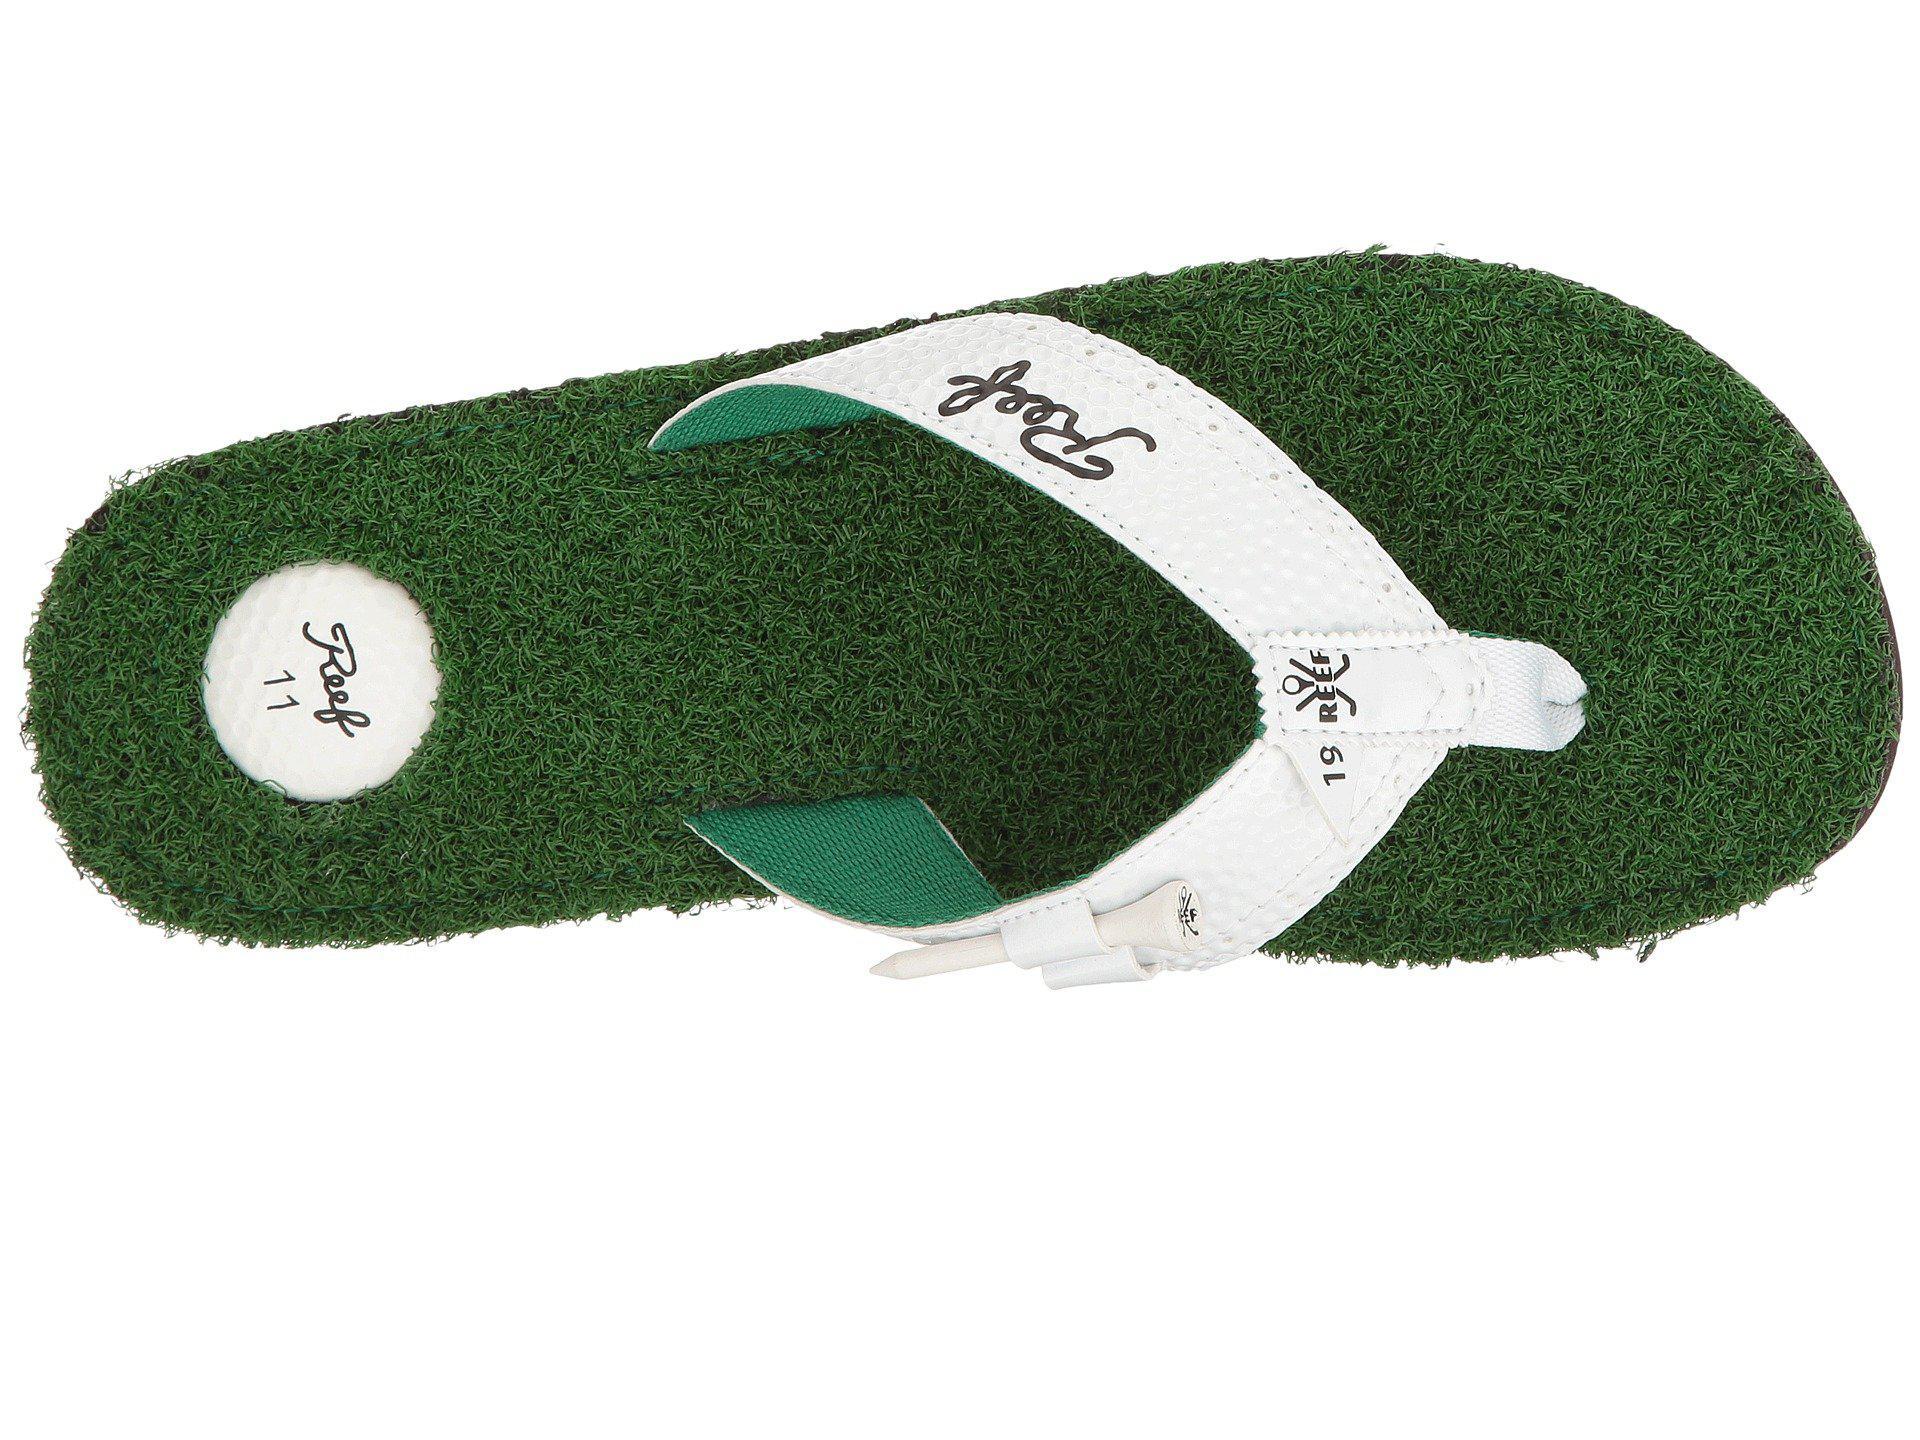 fc86585718d Reef - Mulligan Ii (green) Men s Sandals for Men - Lyst. View fullscreen